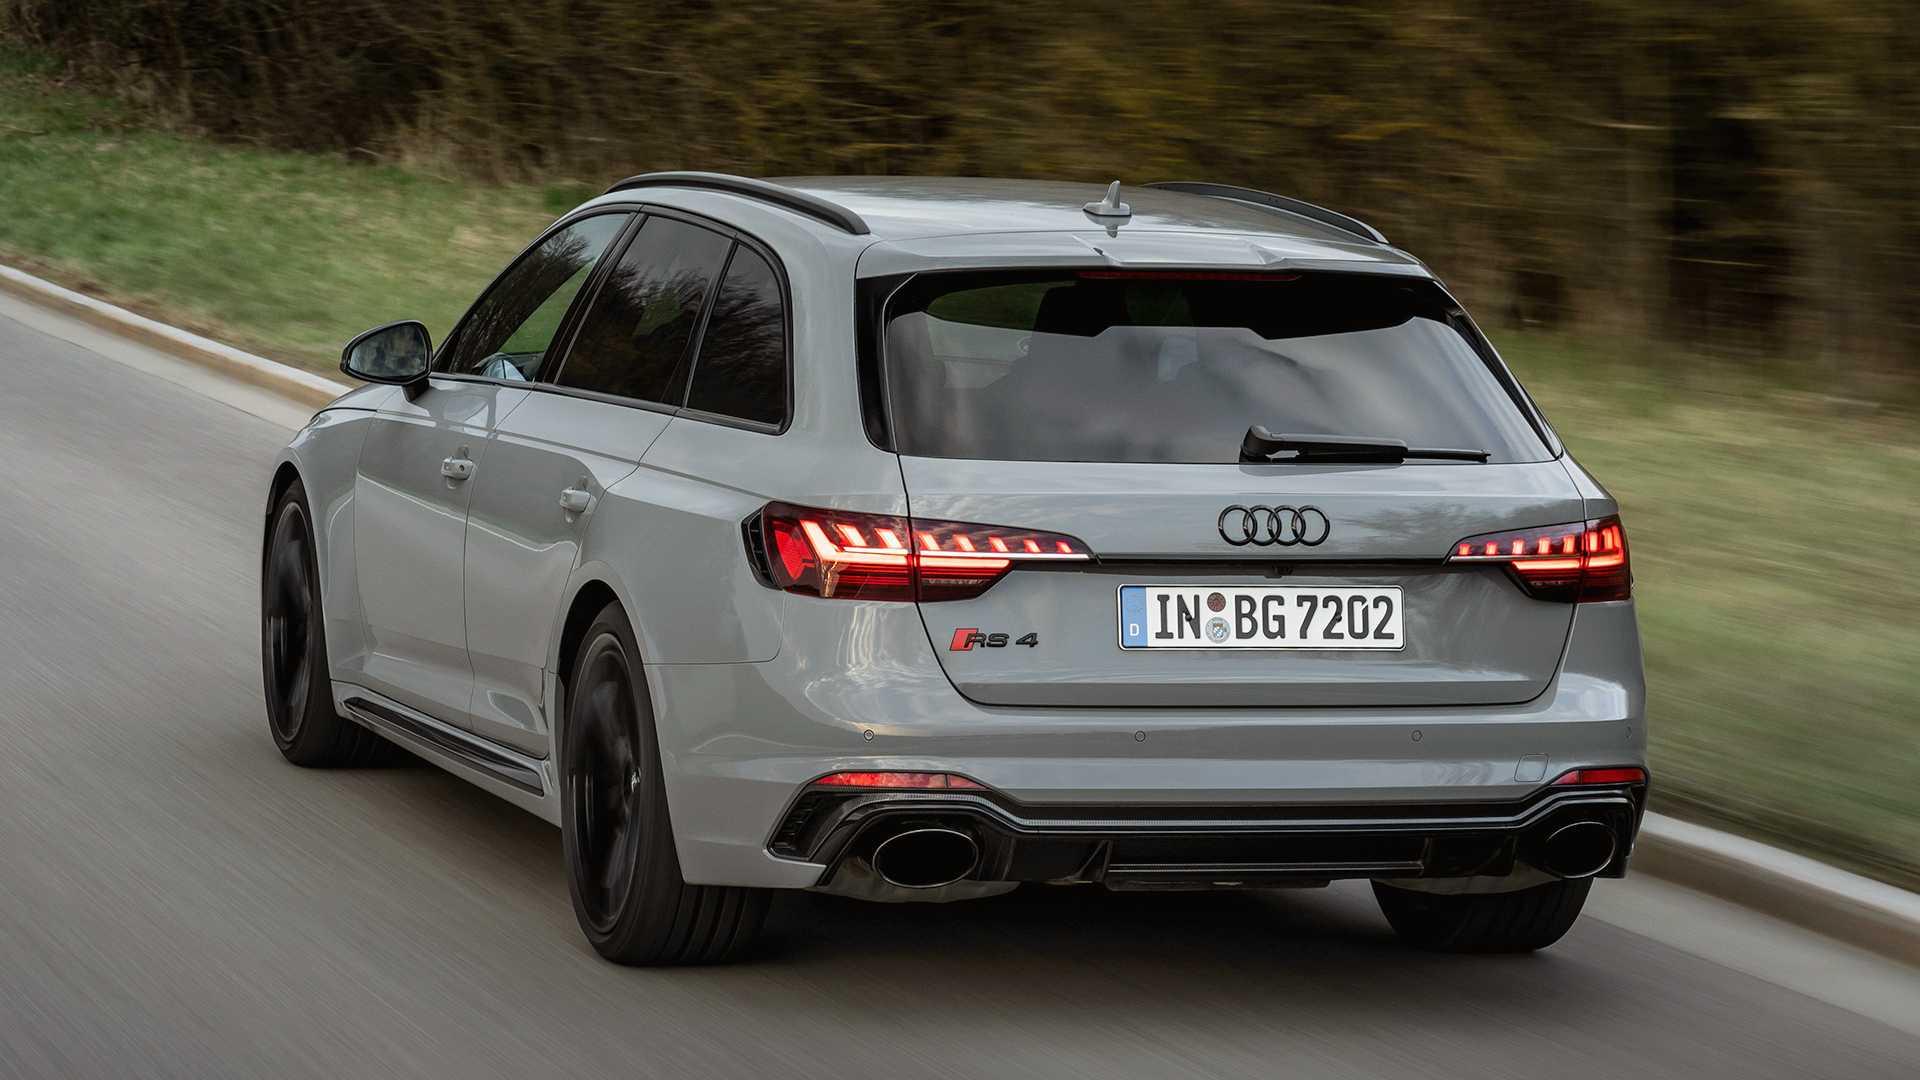 Audi RS 4 Avant 2020, essai